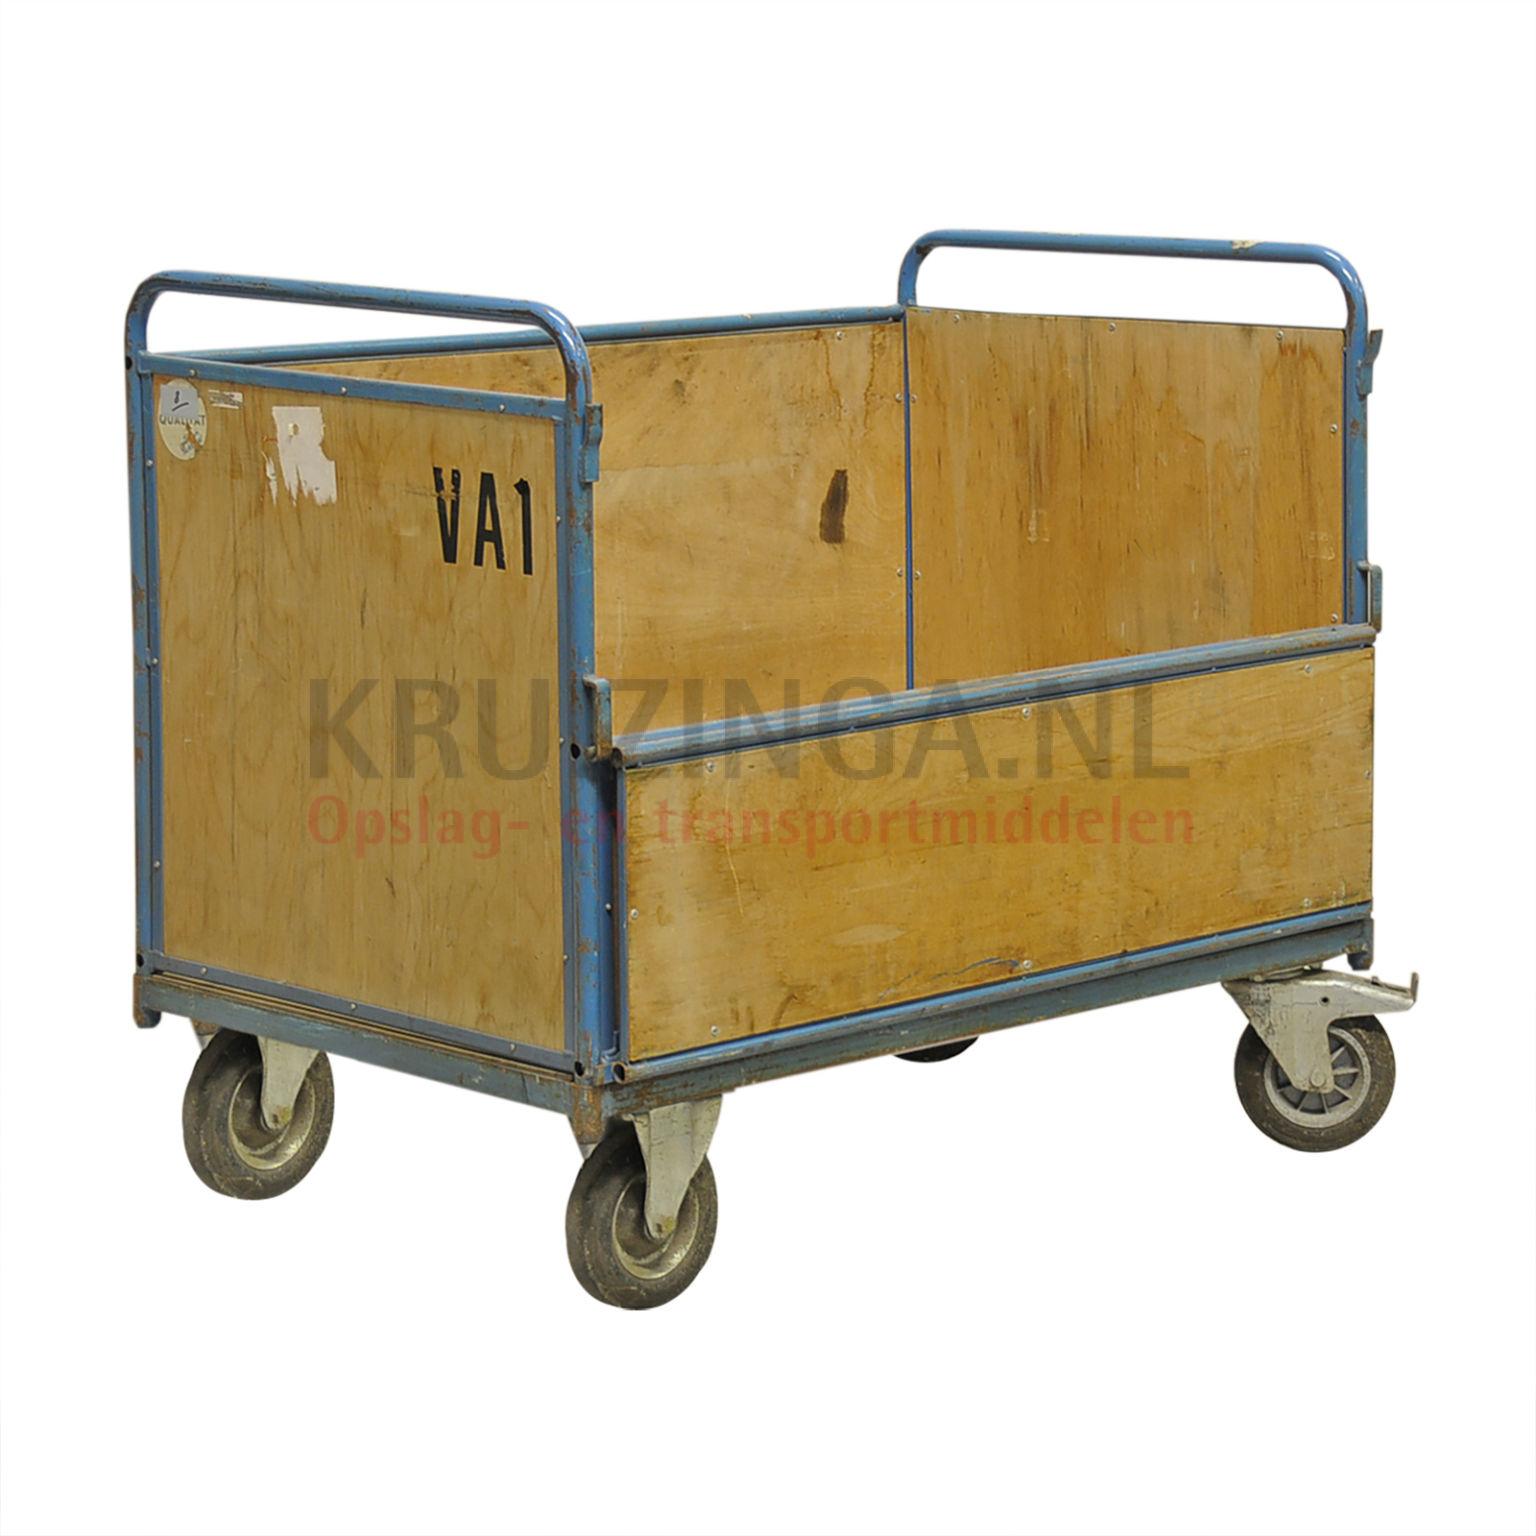 kastenwagen rollwagen kastenwagen 1 klappe an 1 langseite. Black Bedroom Furniture Sets. Home Design Ideas